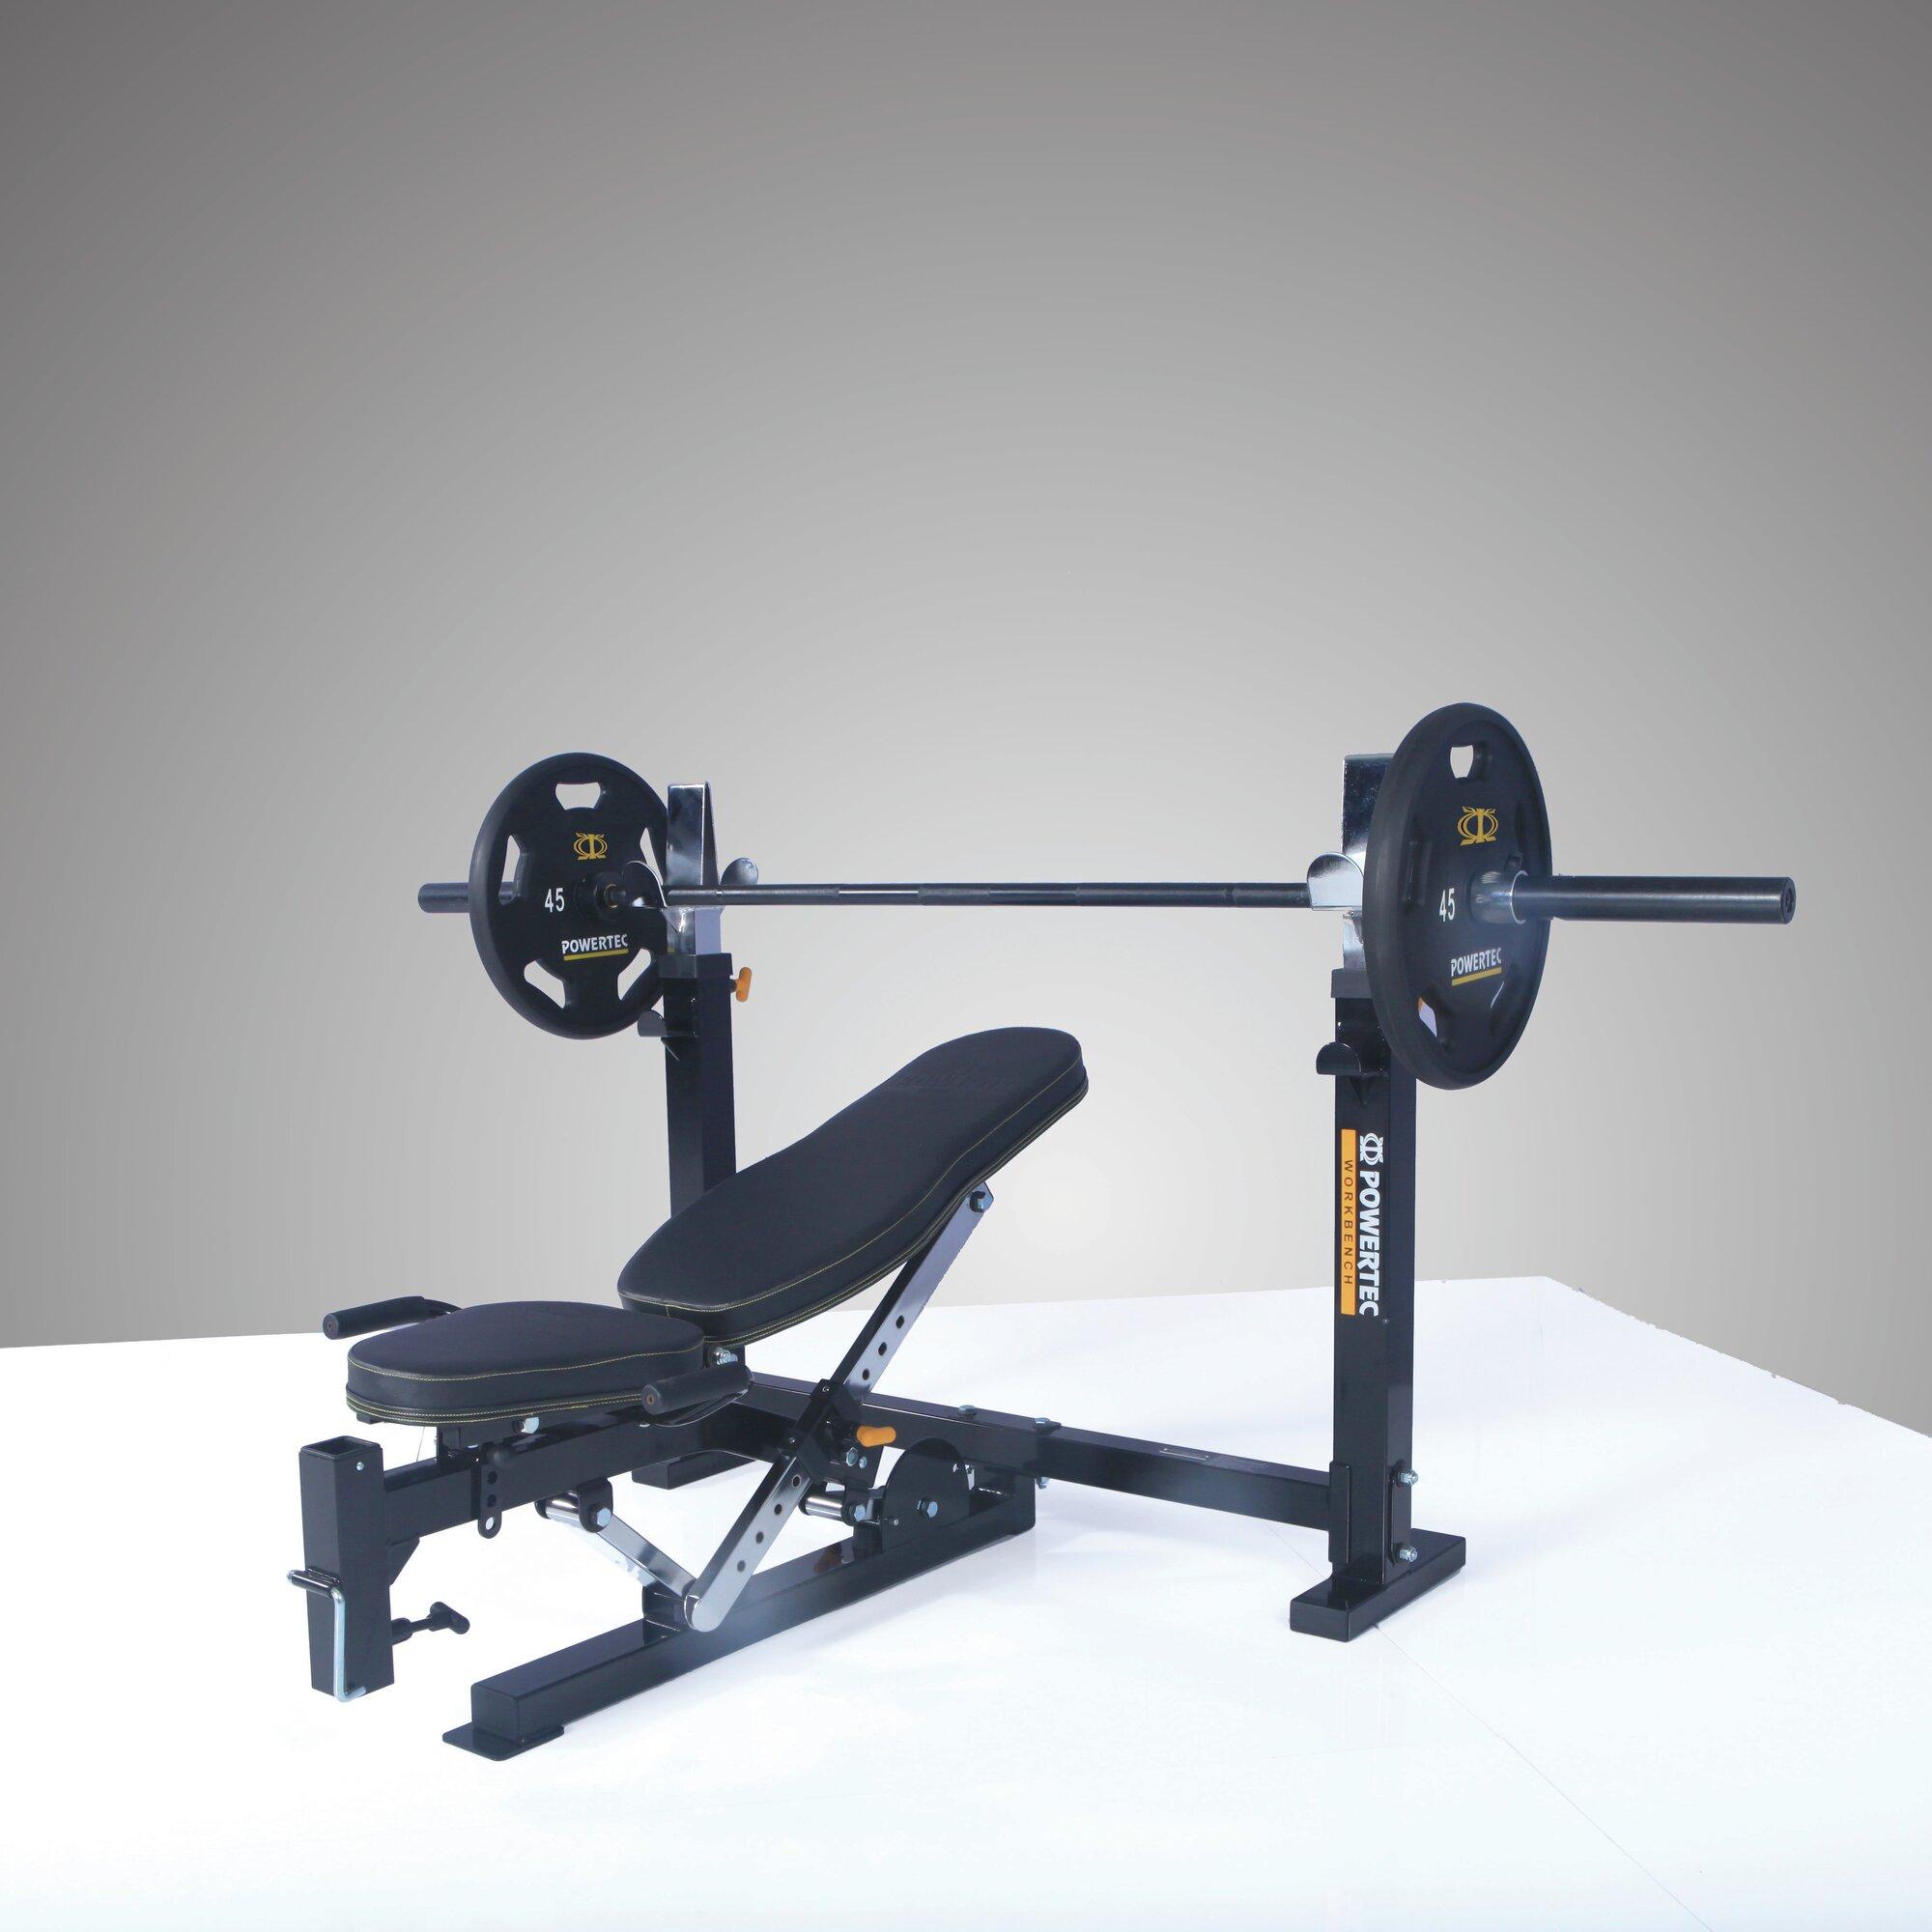 Powertec Workbench Olympic Bench Ebay